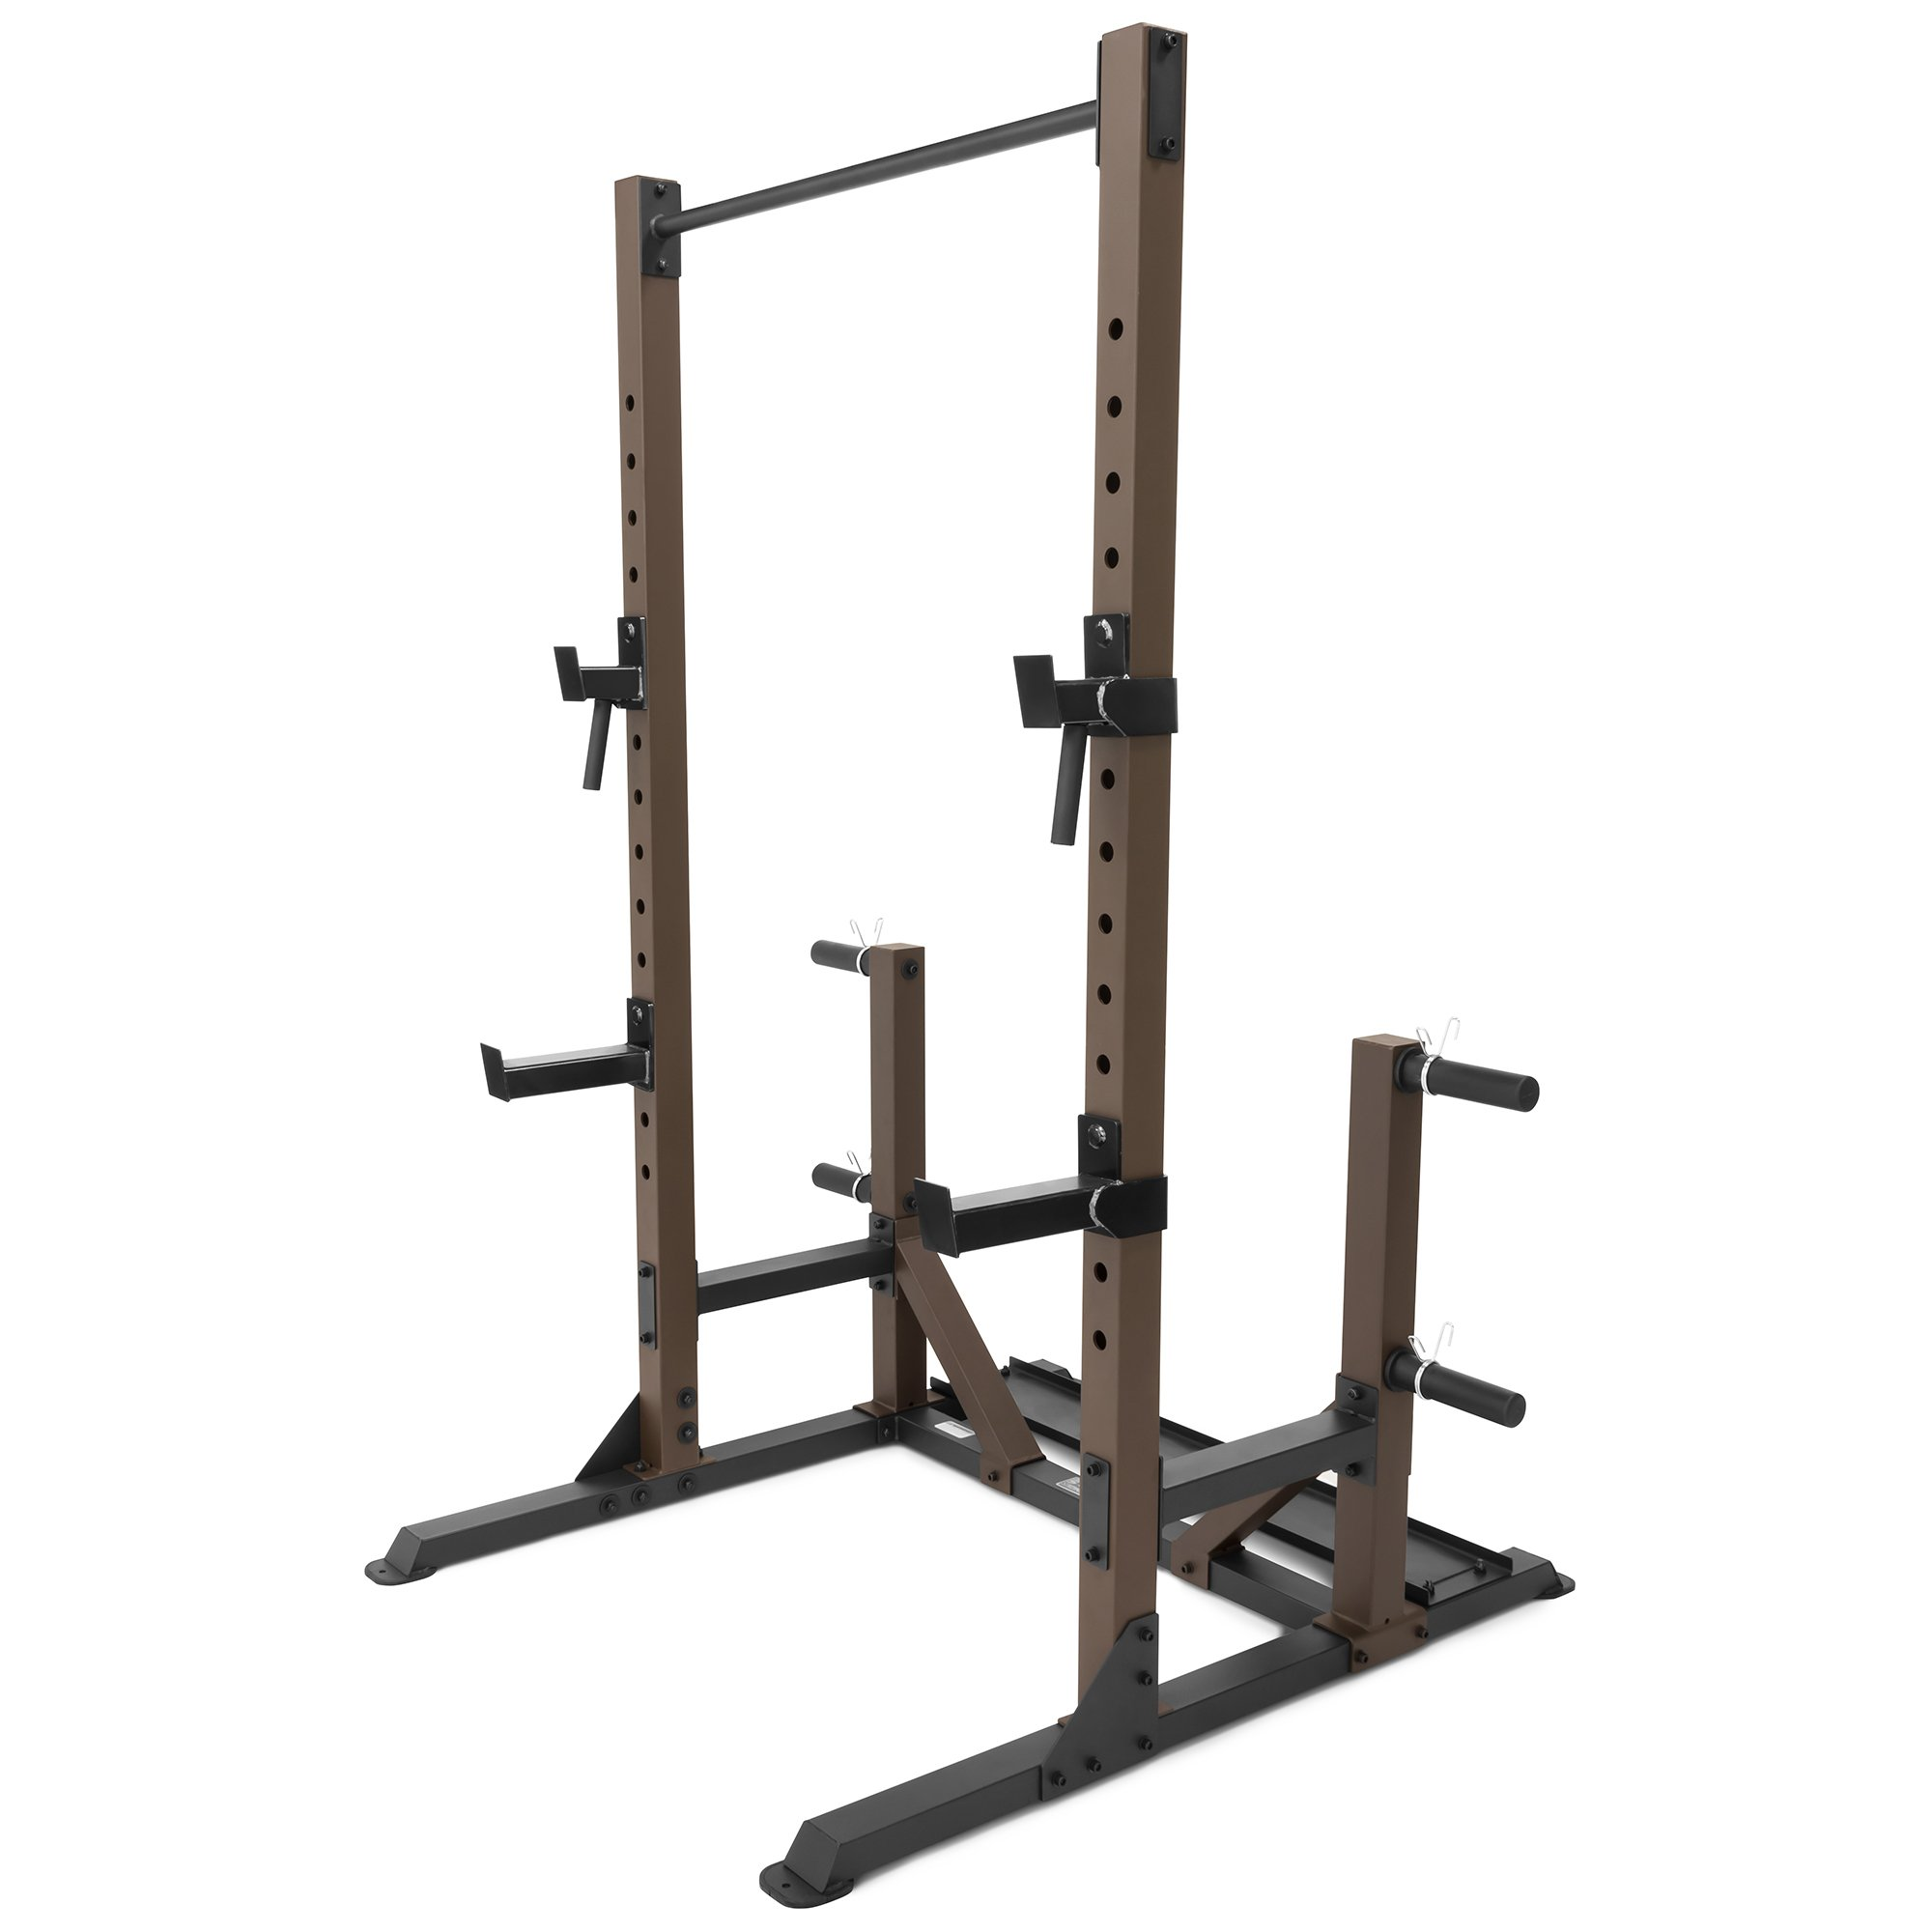 Steelbody Squat Rack Utility Trainer with Weight Storage Posts STB-98010 by Steelbody